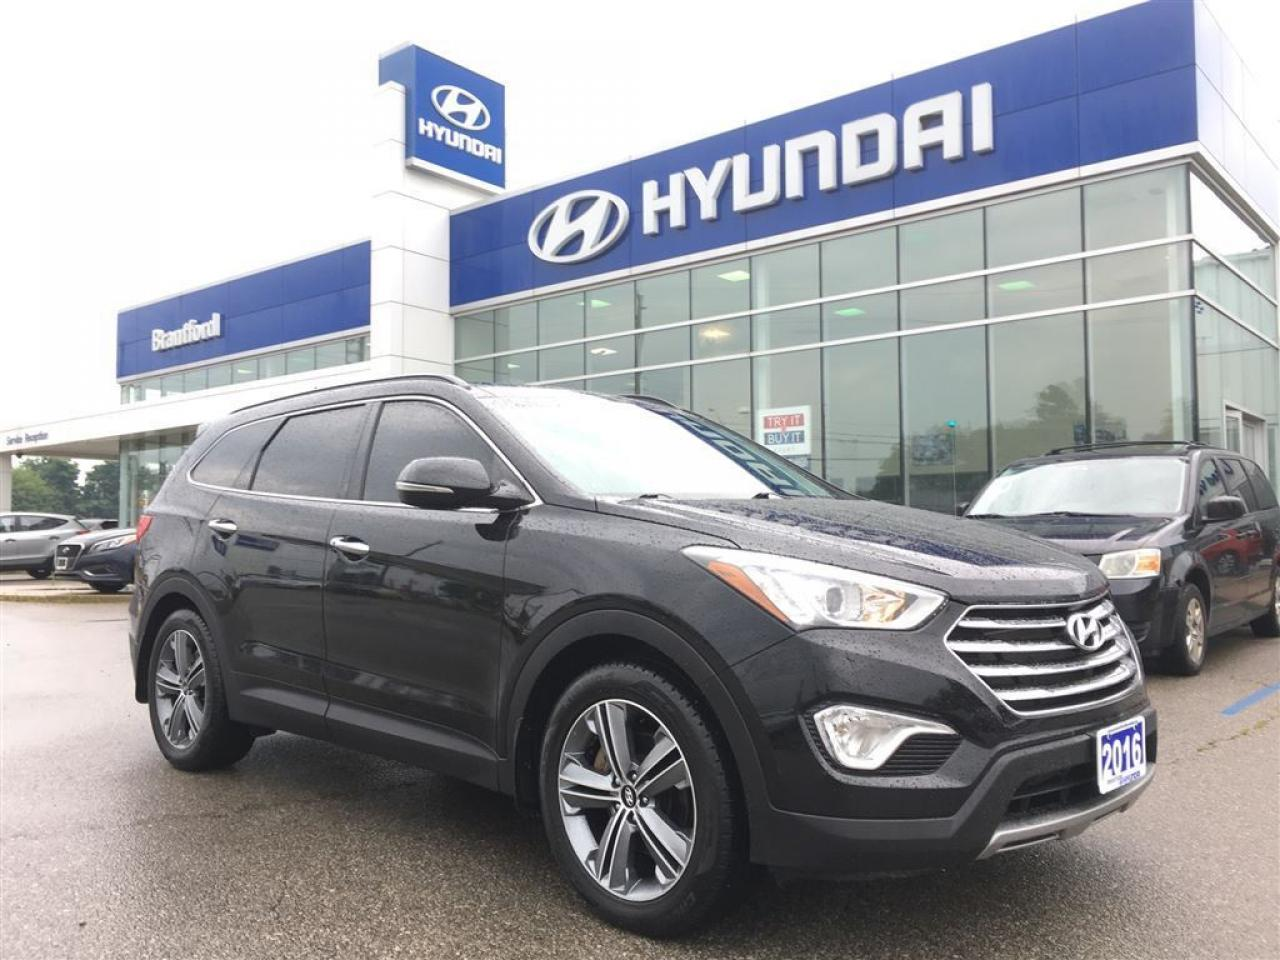 2016 Hyundai Santa Fe XL Limited | 1-Owner | NON-Rental | Serviced Here